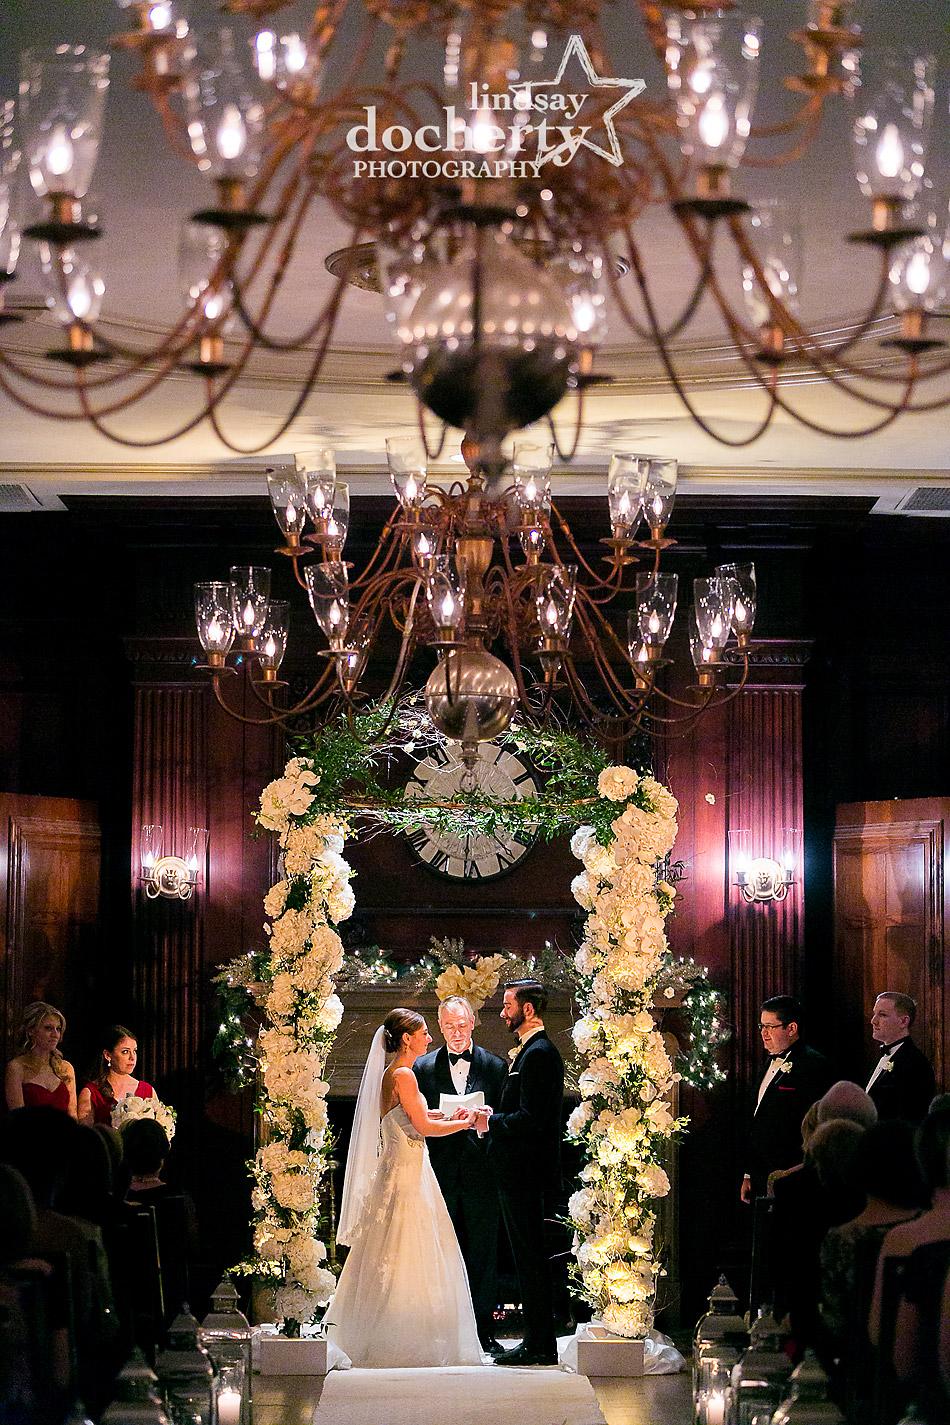 wedding-ceremony-at-the-Union-League-in-Philadelphia-under-chuppah